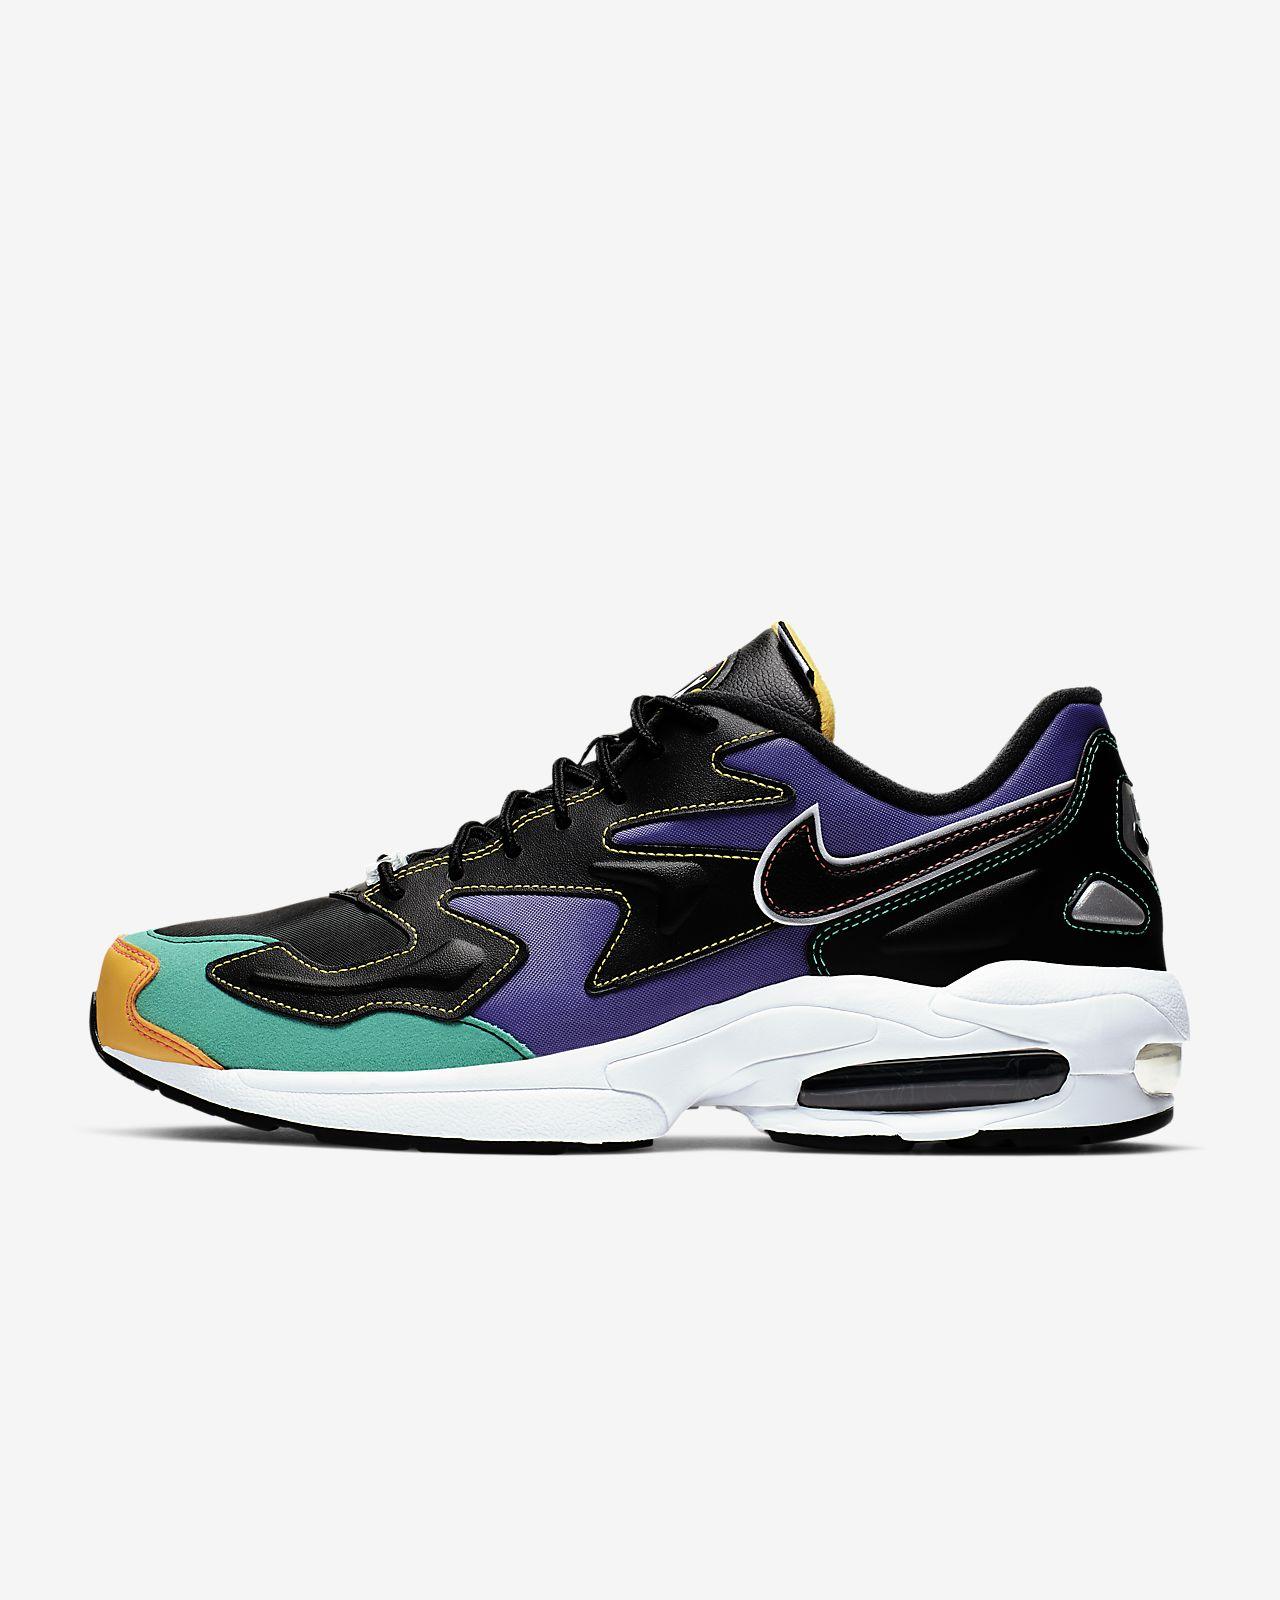 Nike Air Max2 Light Premium Men's Shoe